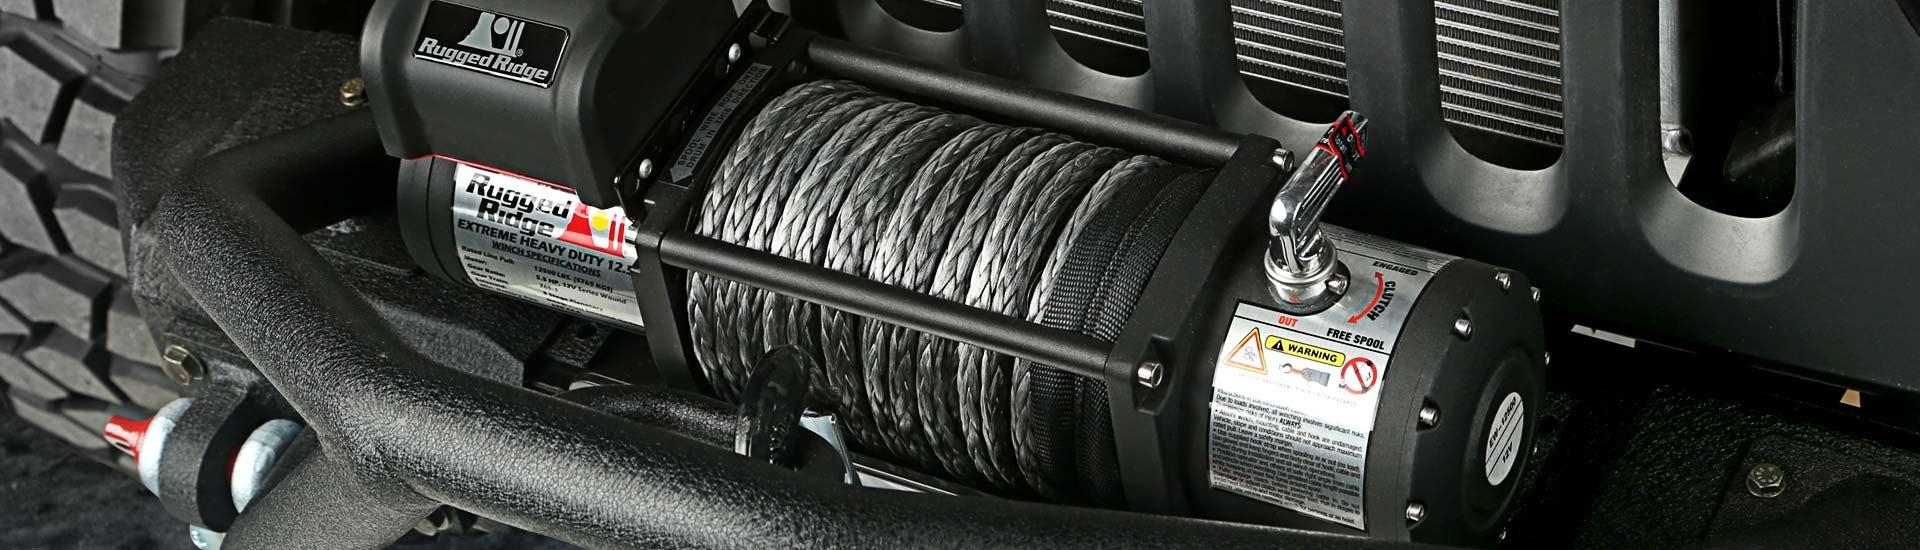 Winches Accessories Jeeps Trucks Suvs Warn 12 000 Lb Winch Additionally Wiring Diagram Also 4 11